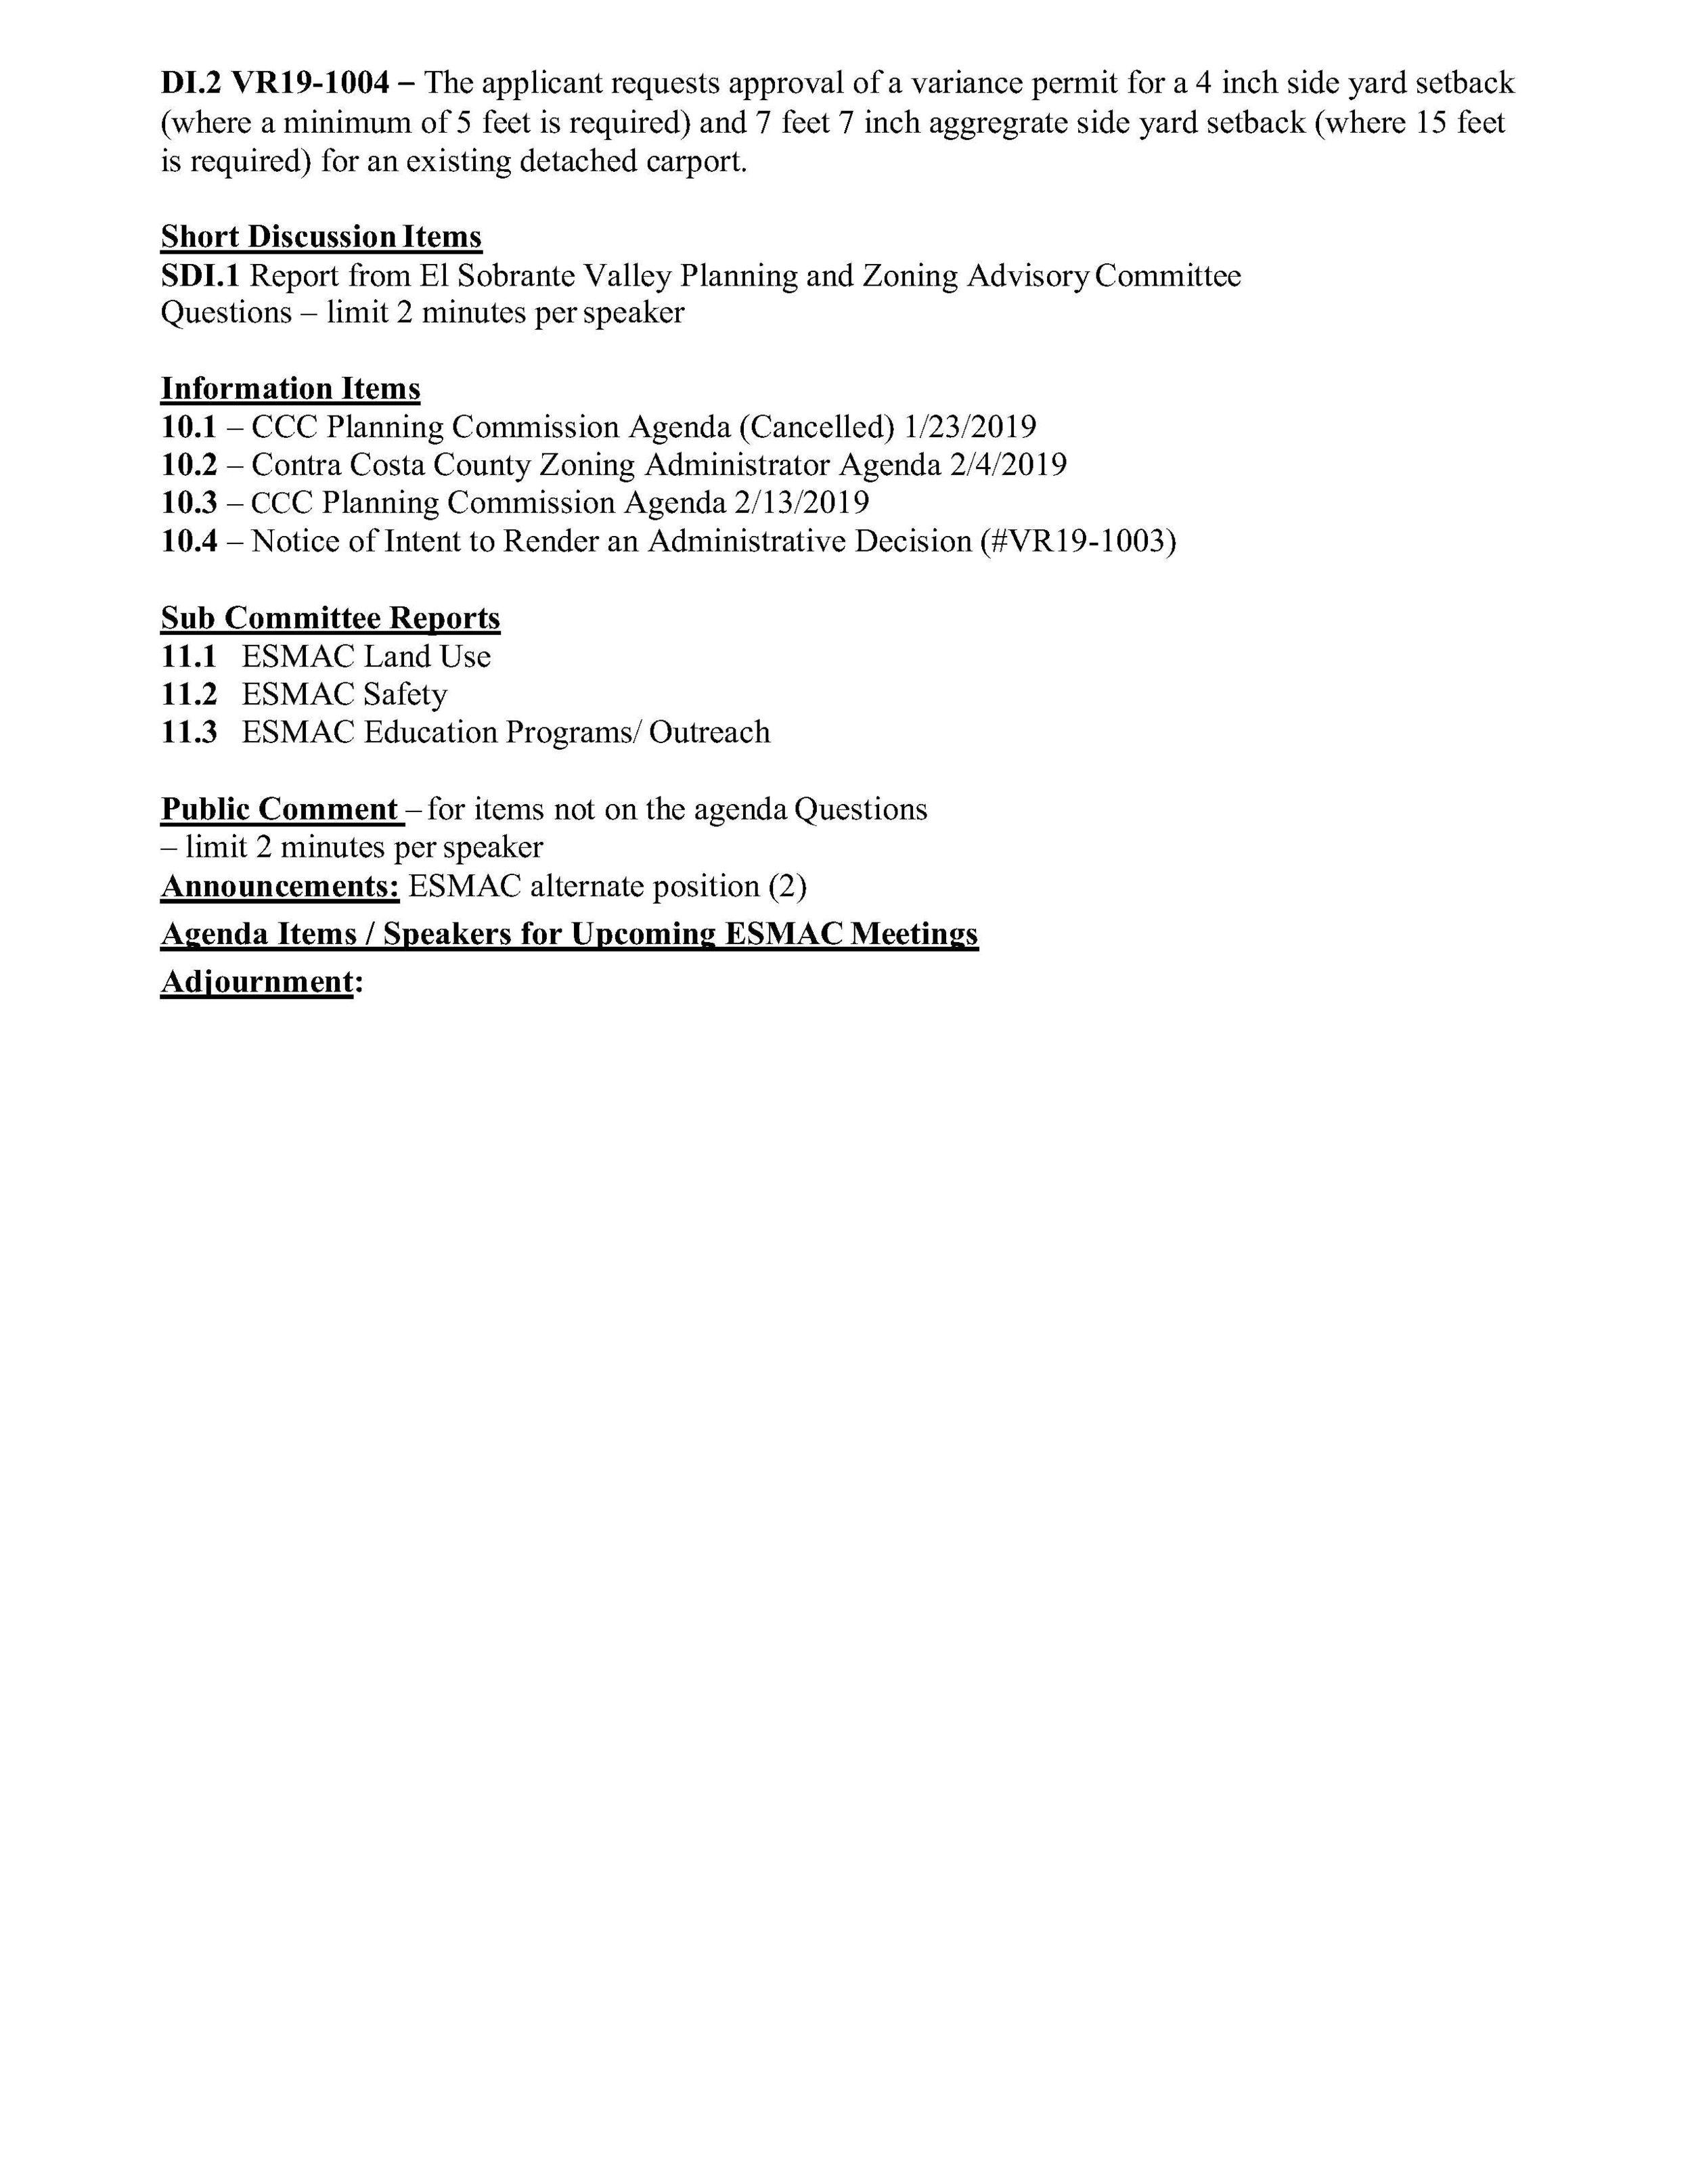 ESMAC Agenda 2.13.2019b_2.jpg